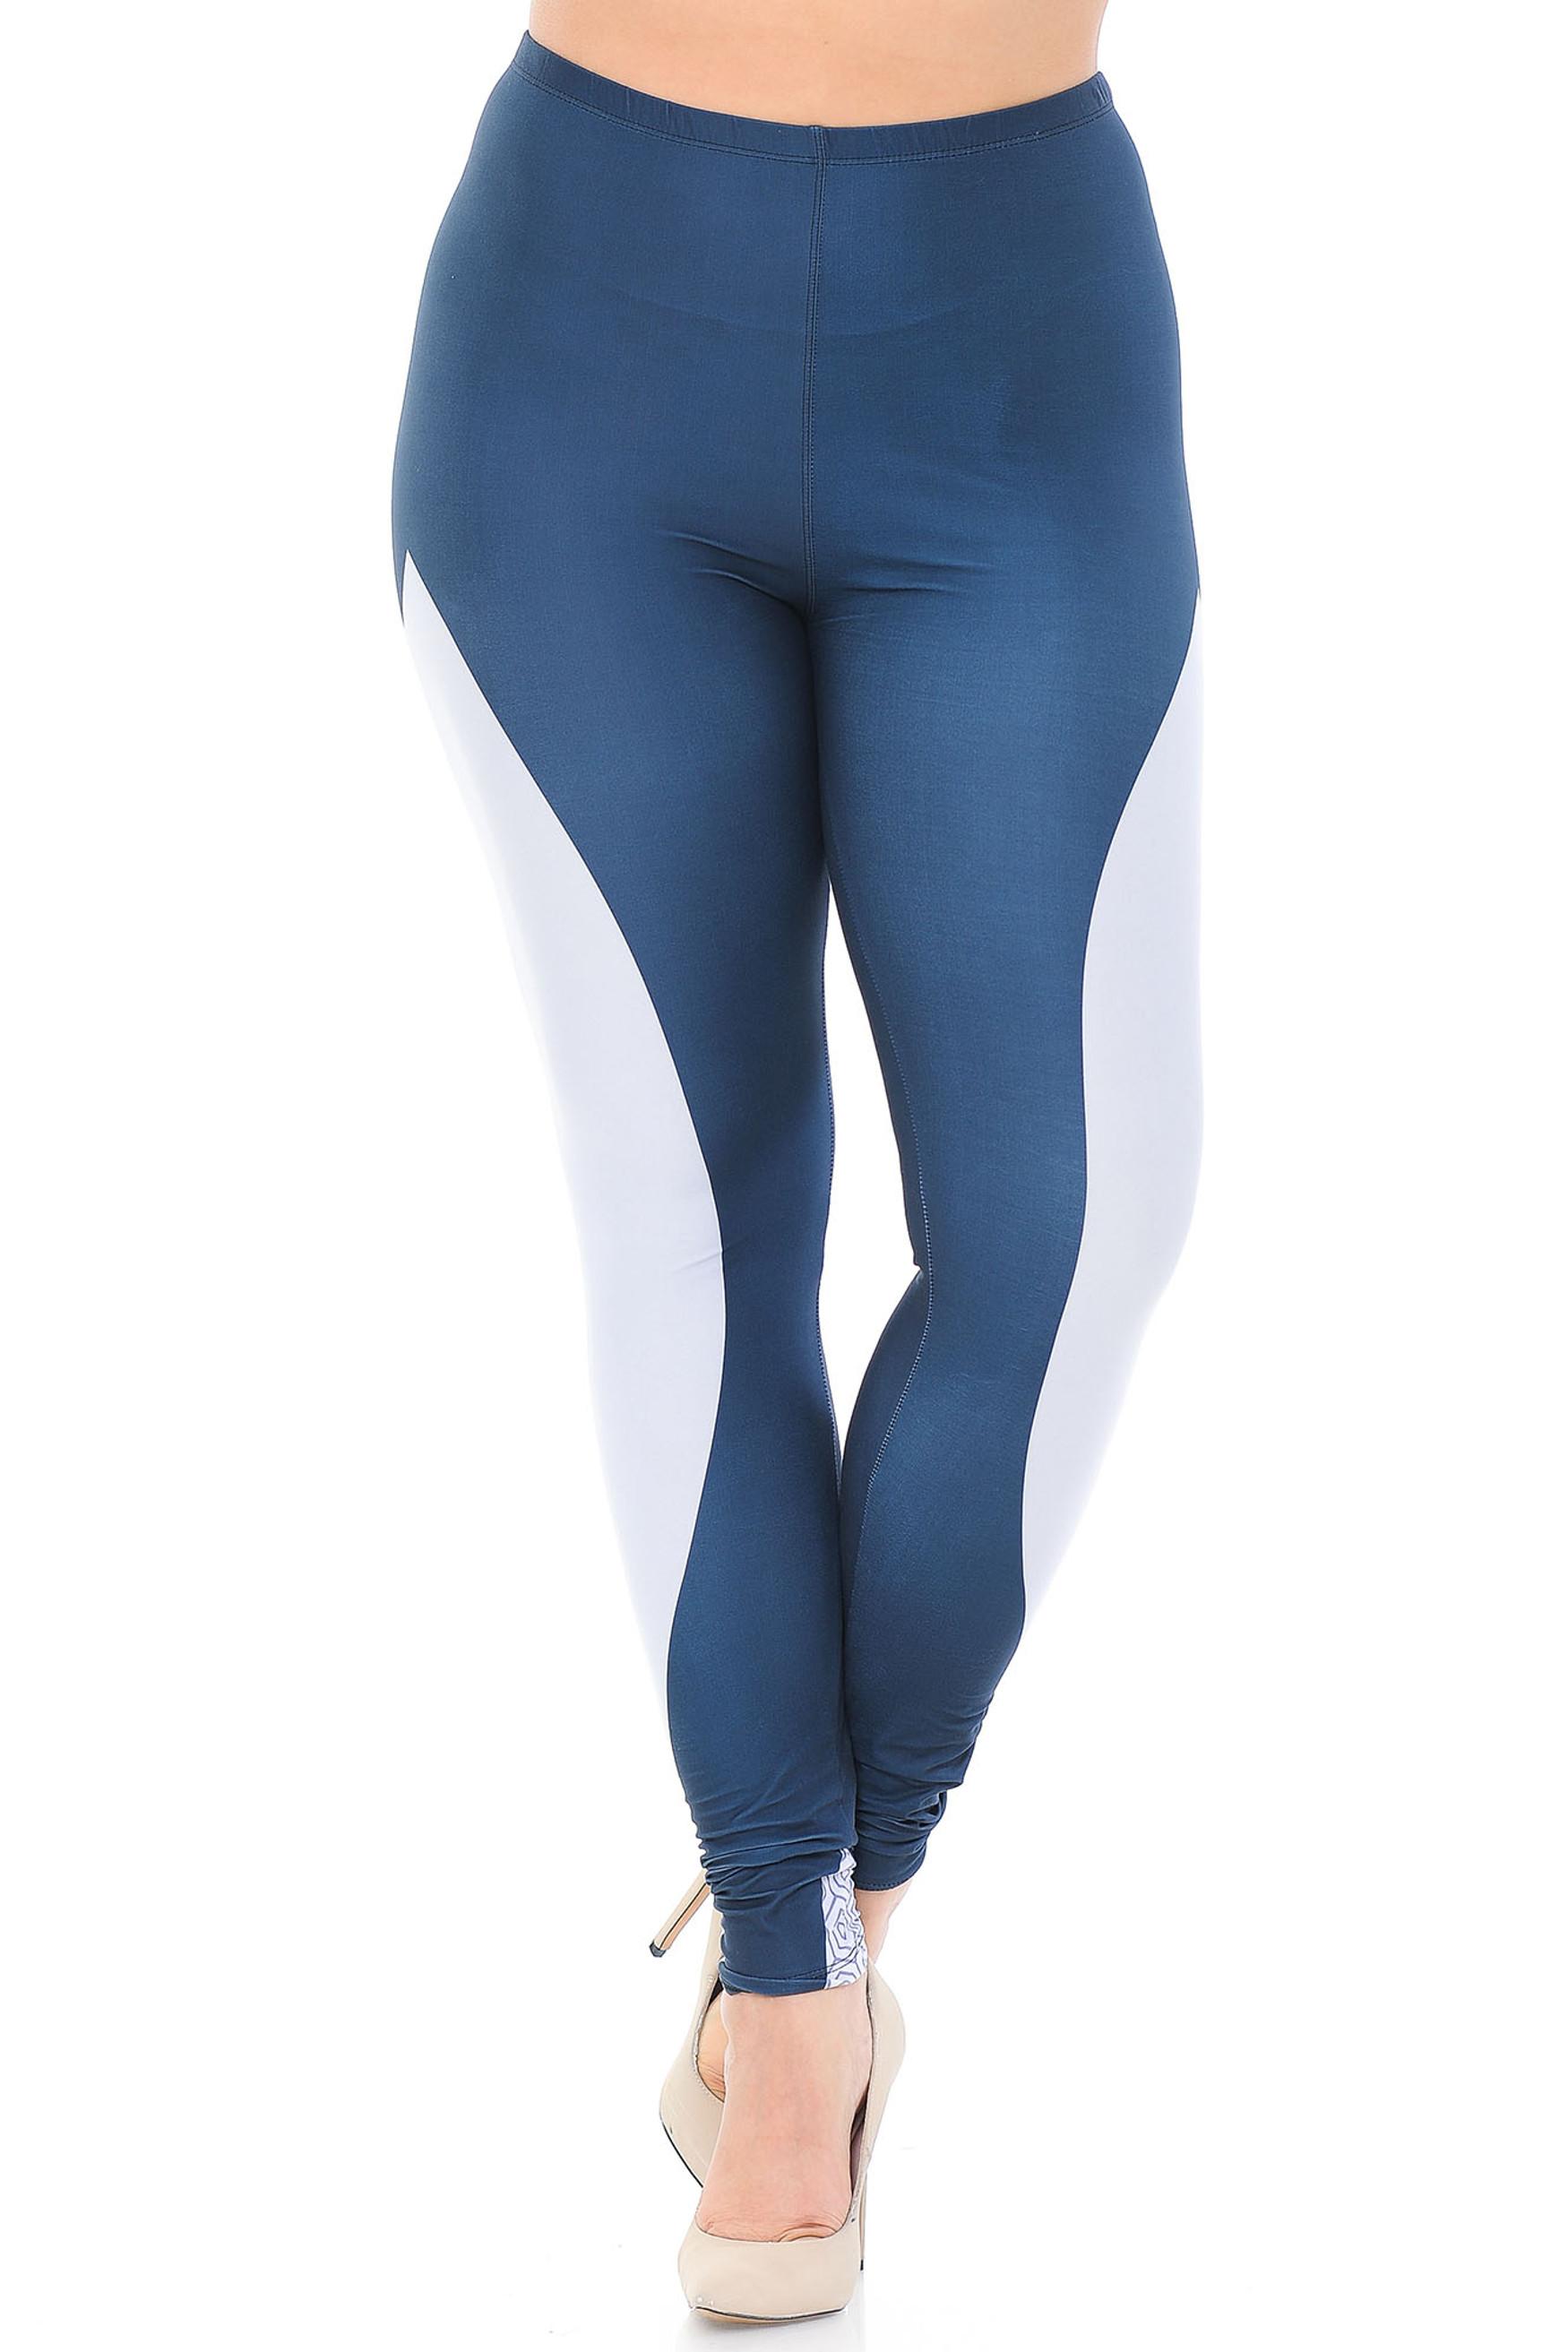 Creamy Soft Contour Curves Plus Size Leggings - USA Fashion™